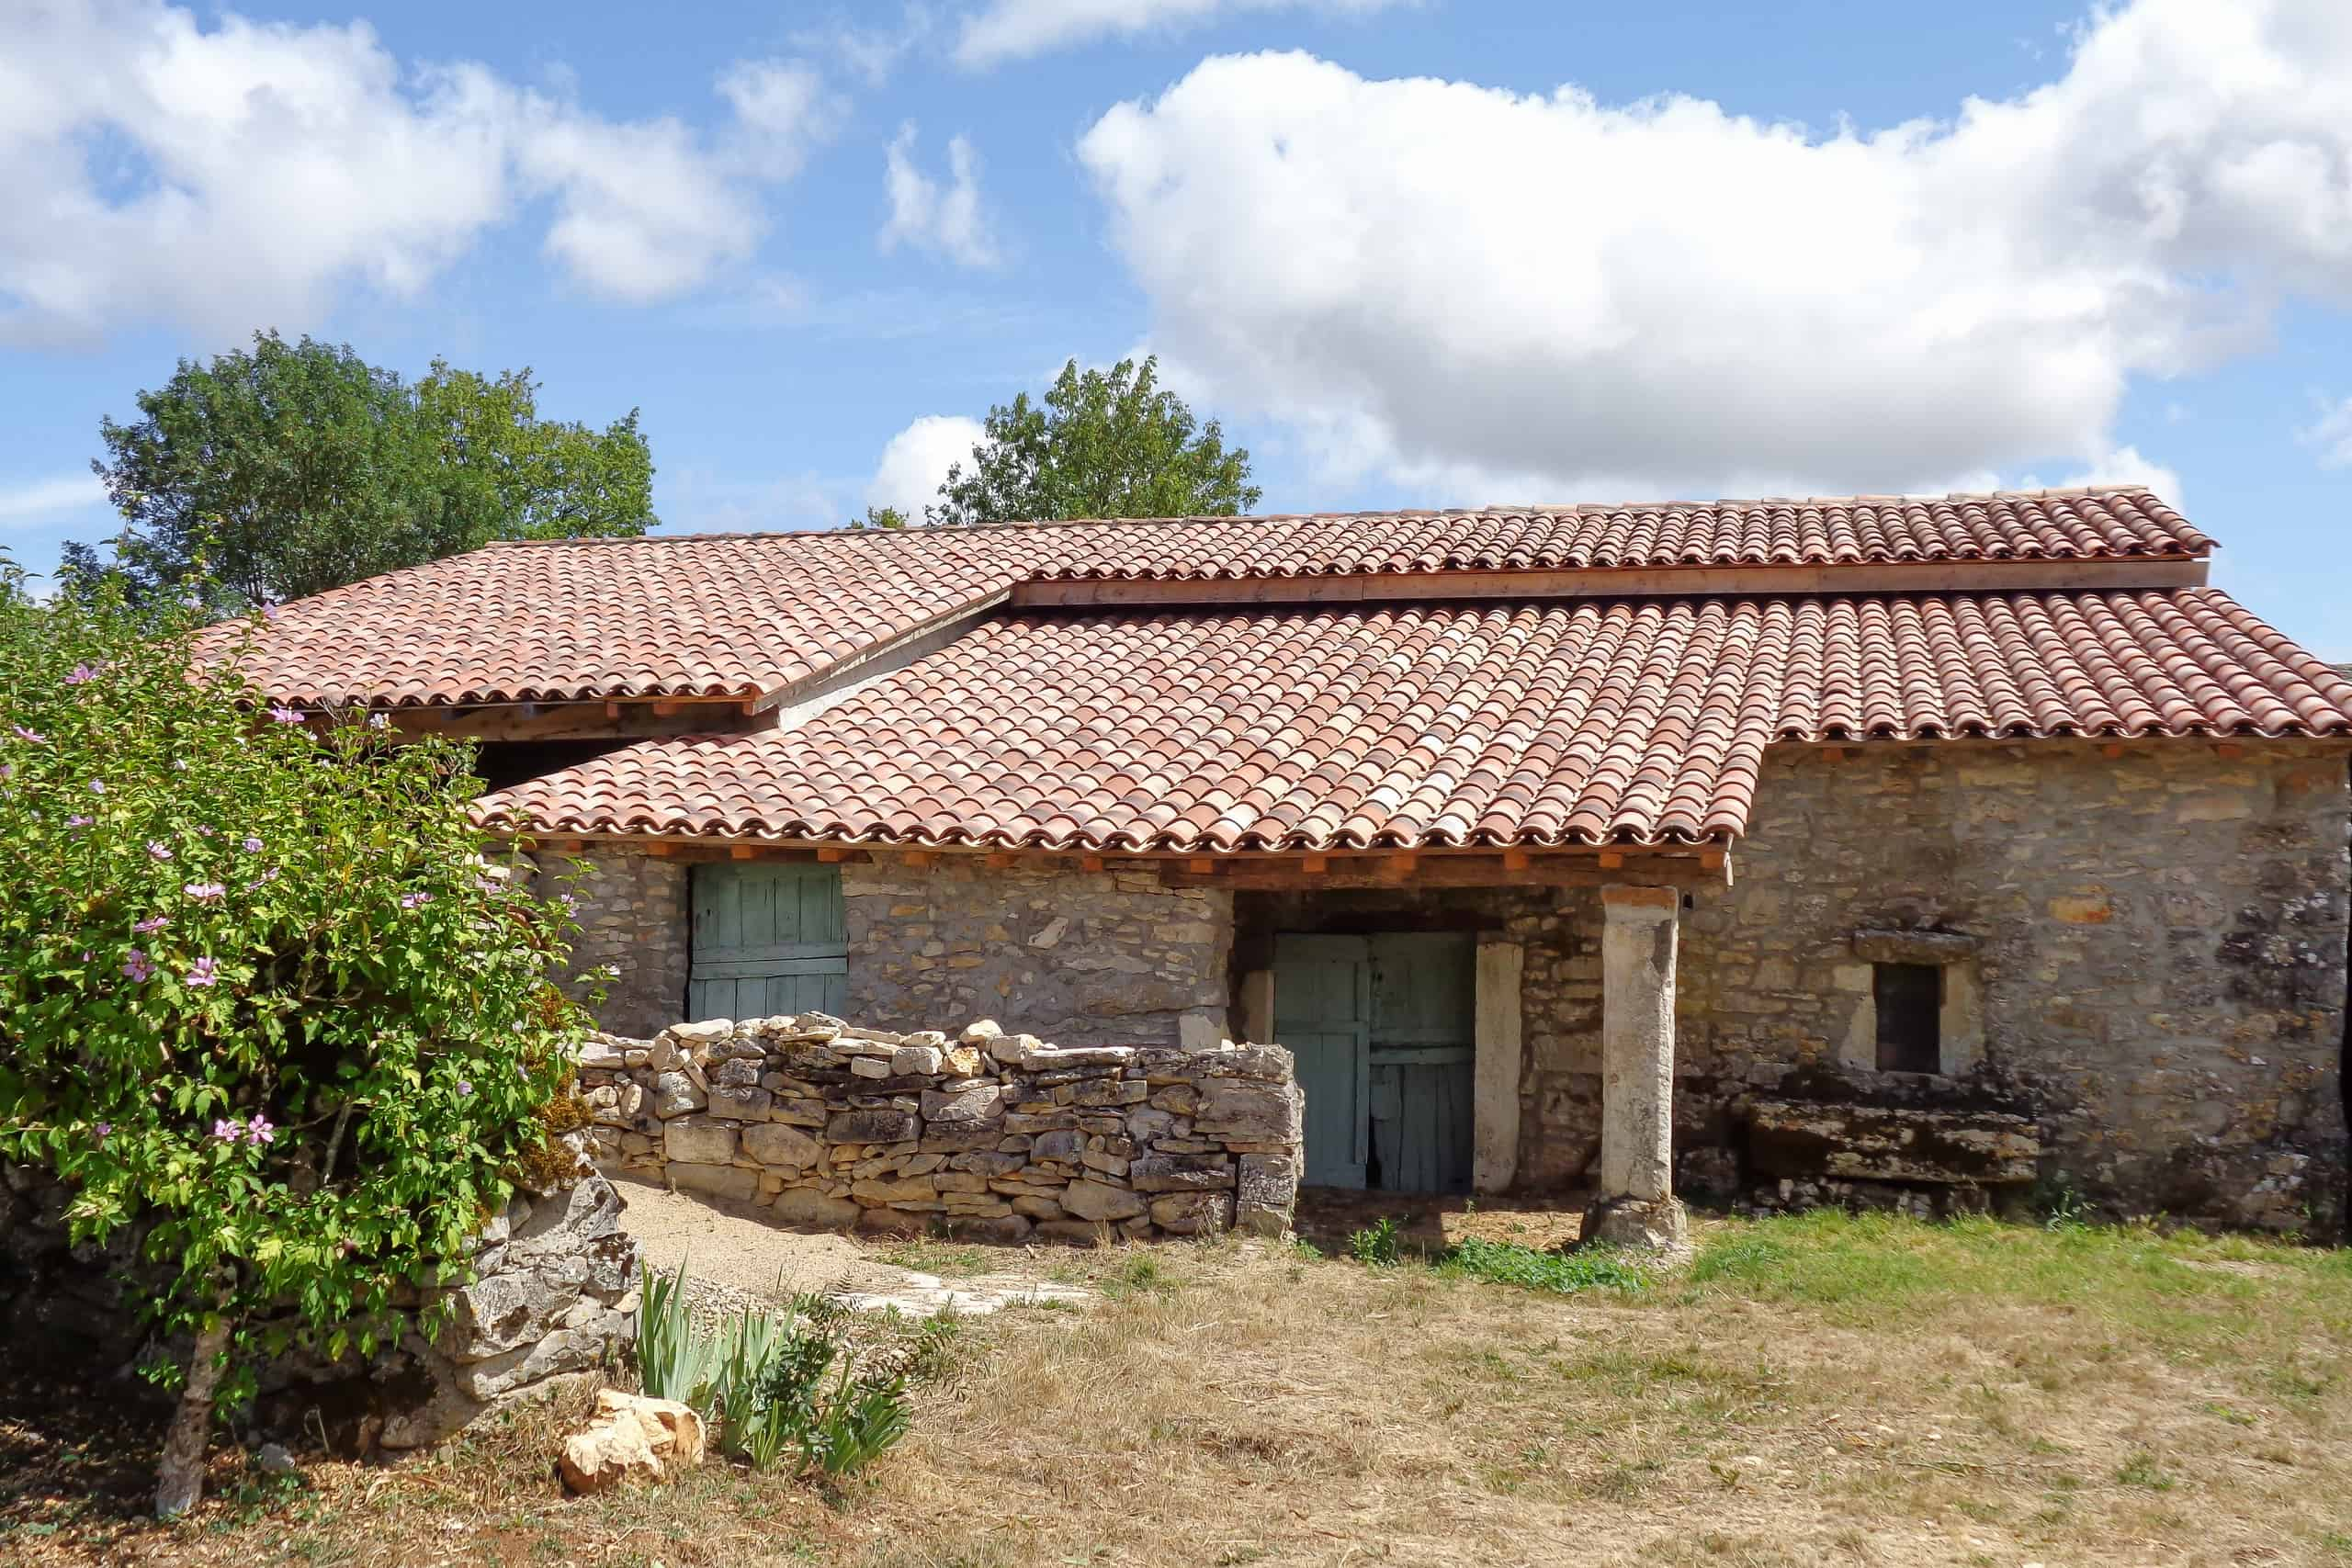 Barn-roof-WMC018